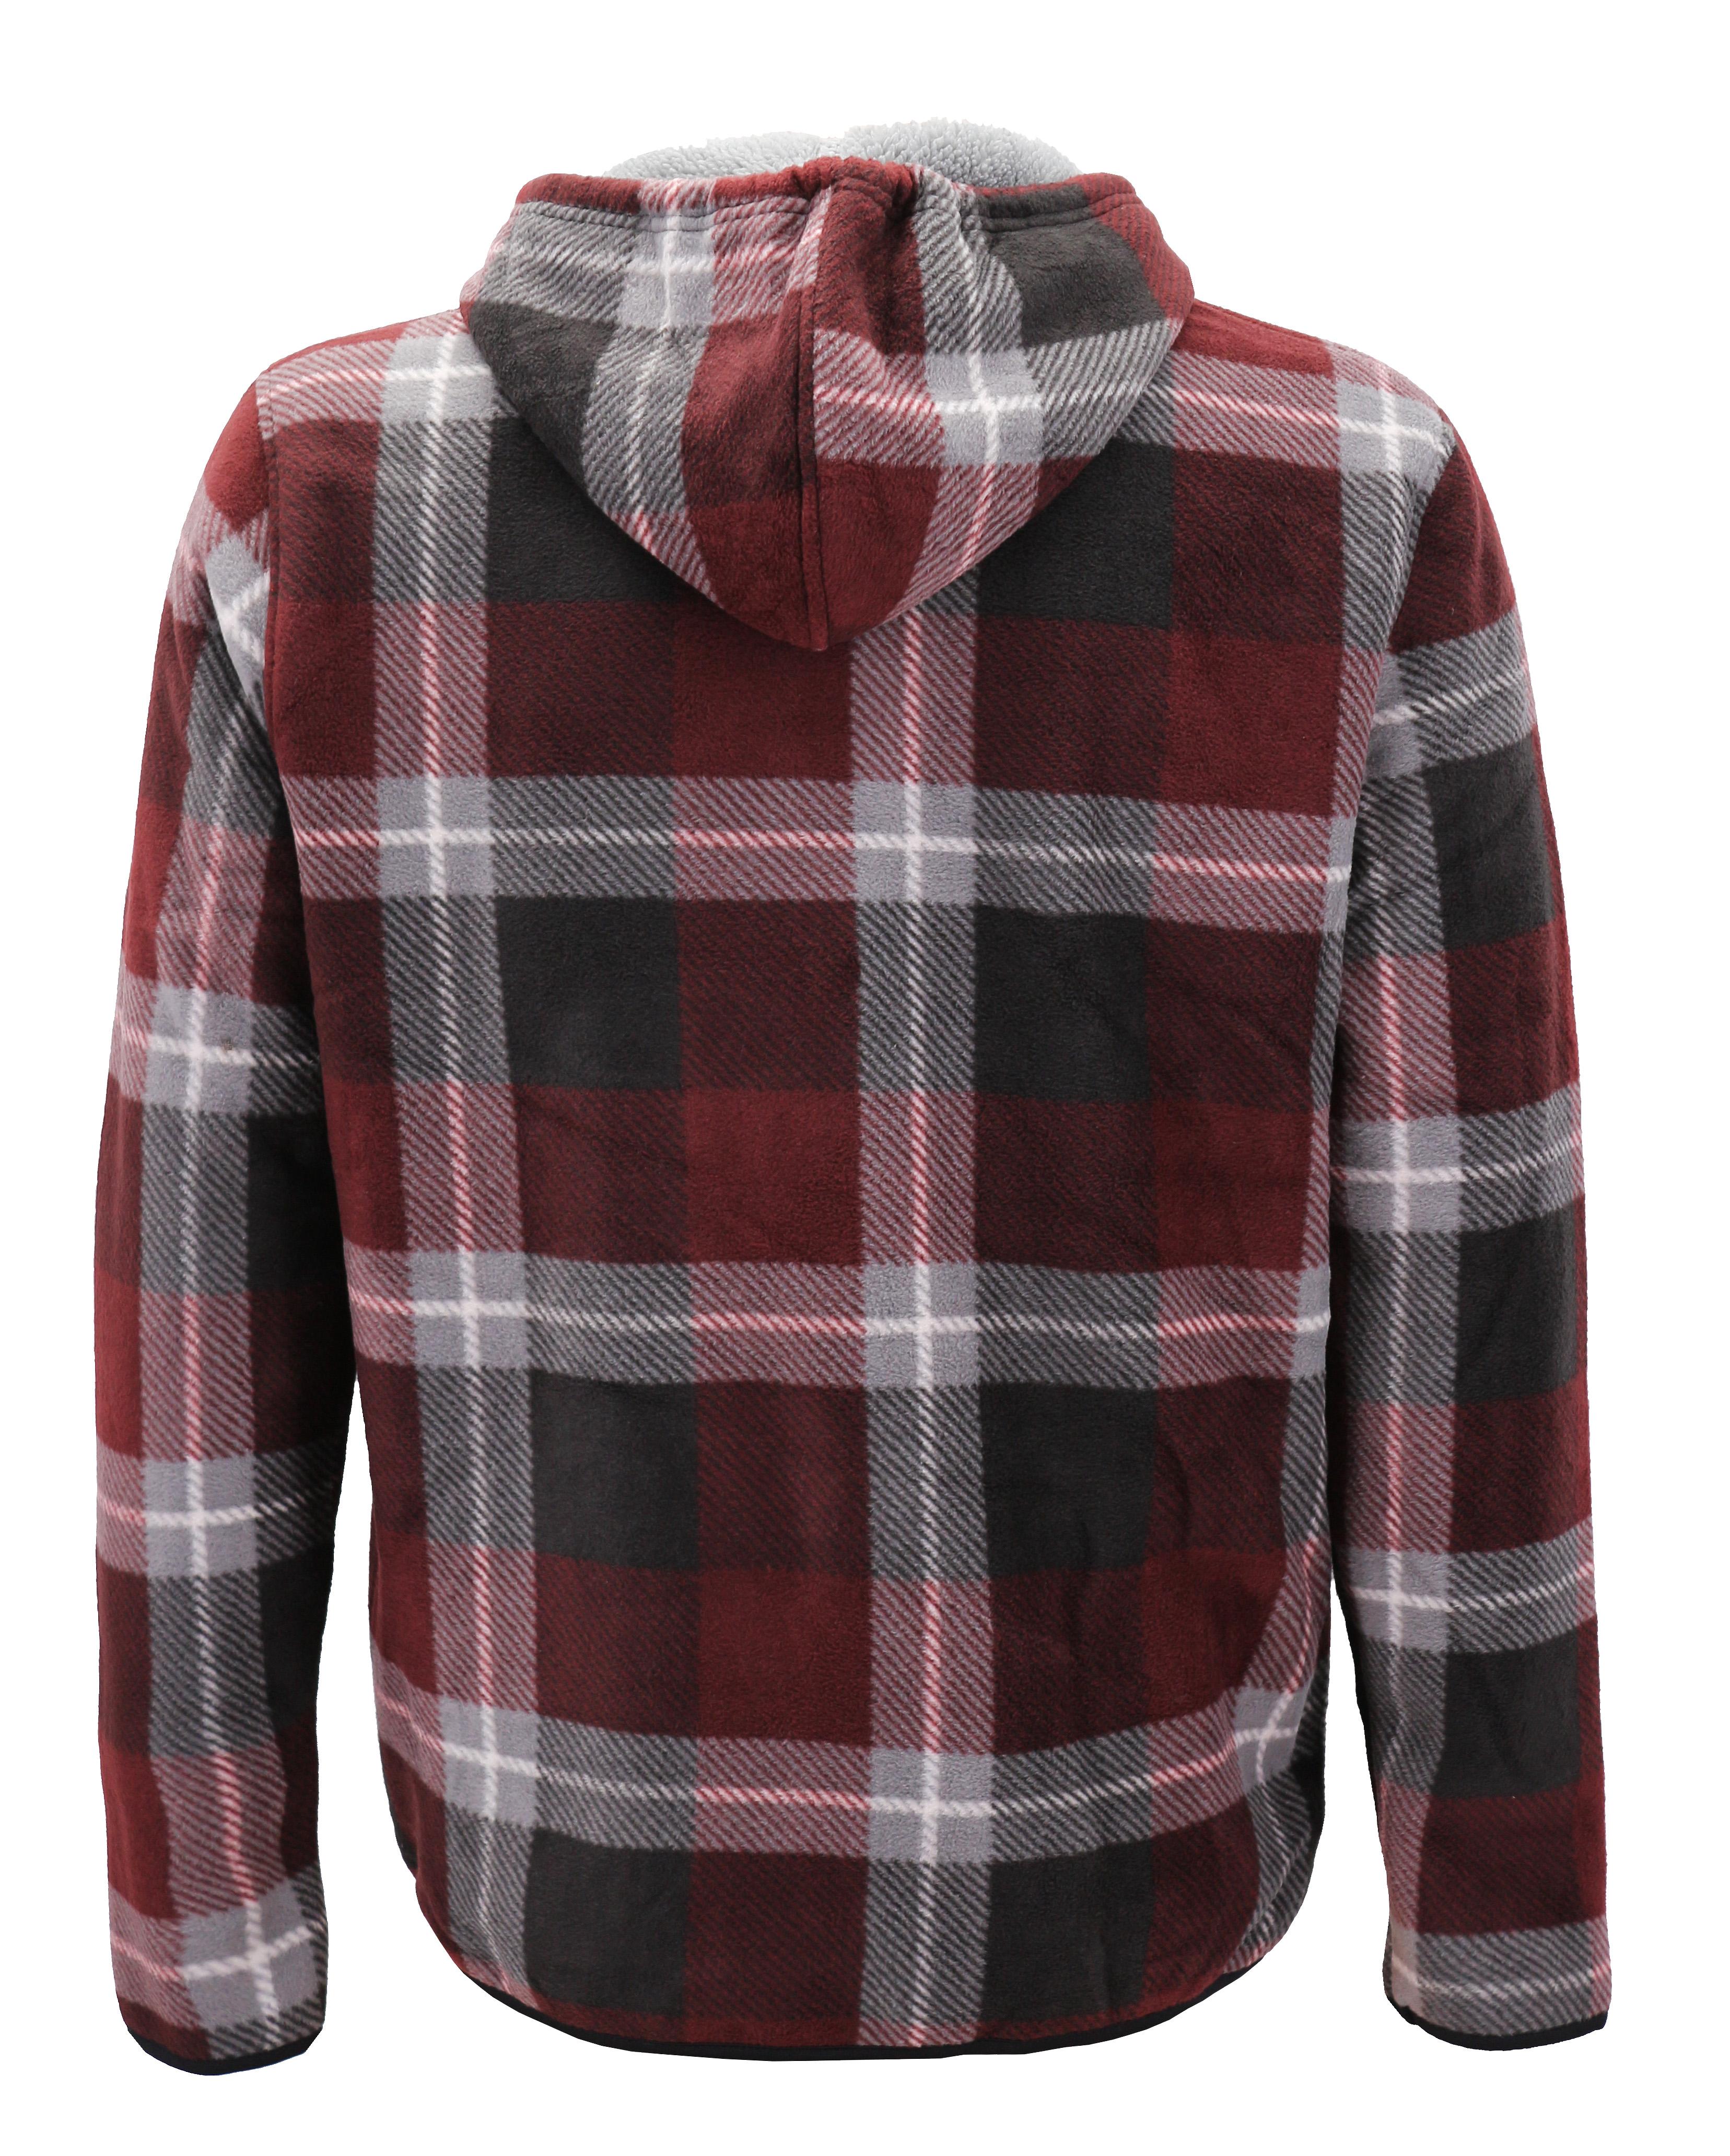 Men-039-s-Casual-Flannel-Zip-Up-Fleece-Lined-Plaid-Sherpa-Hoodie-Lightweight-Jacket thumbnail 3